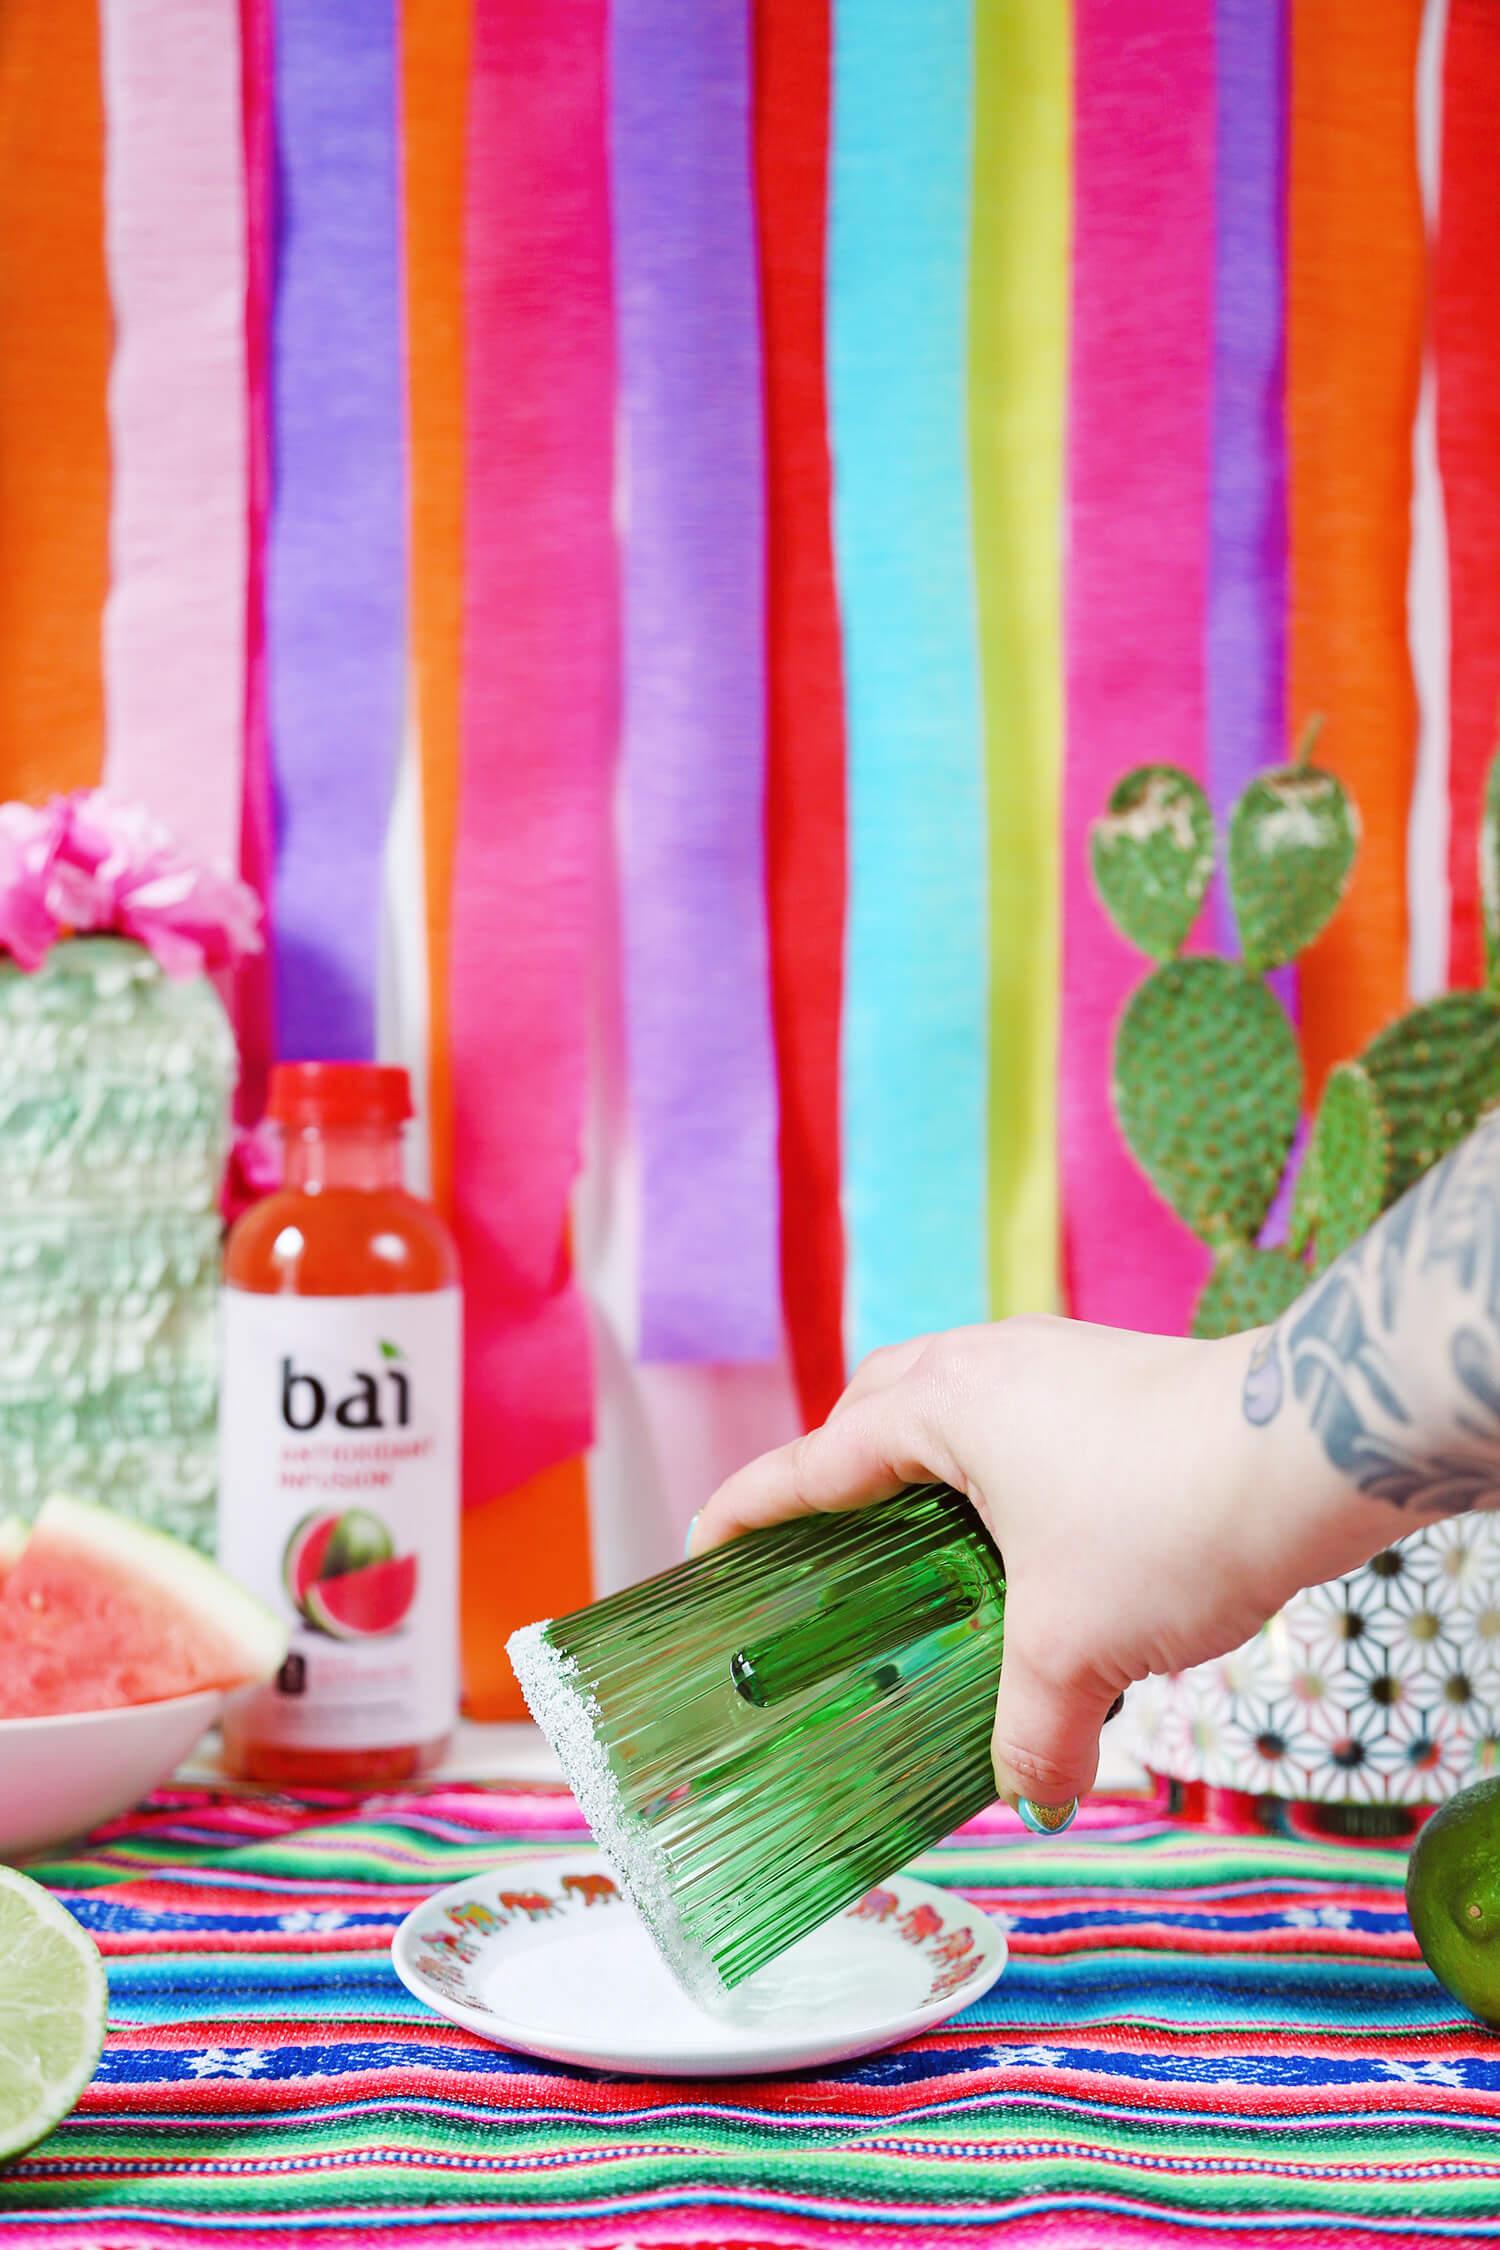 Watermelon Habanero Hibiscus Mezcalito